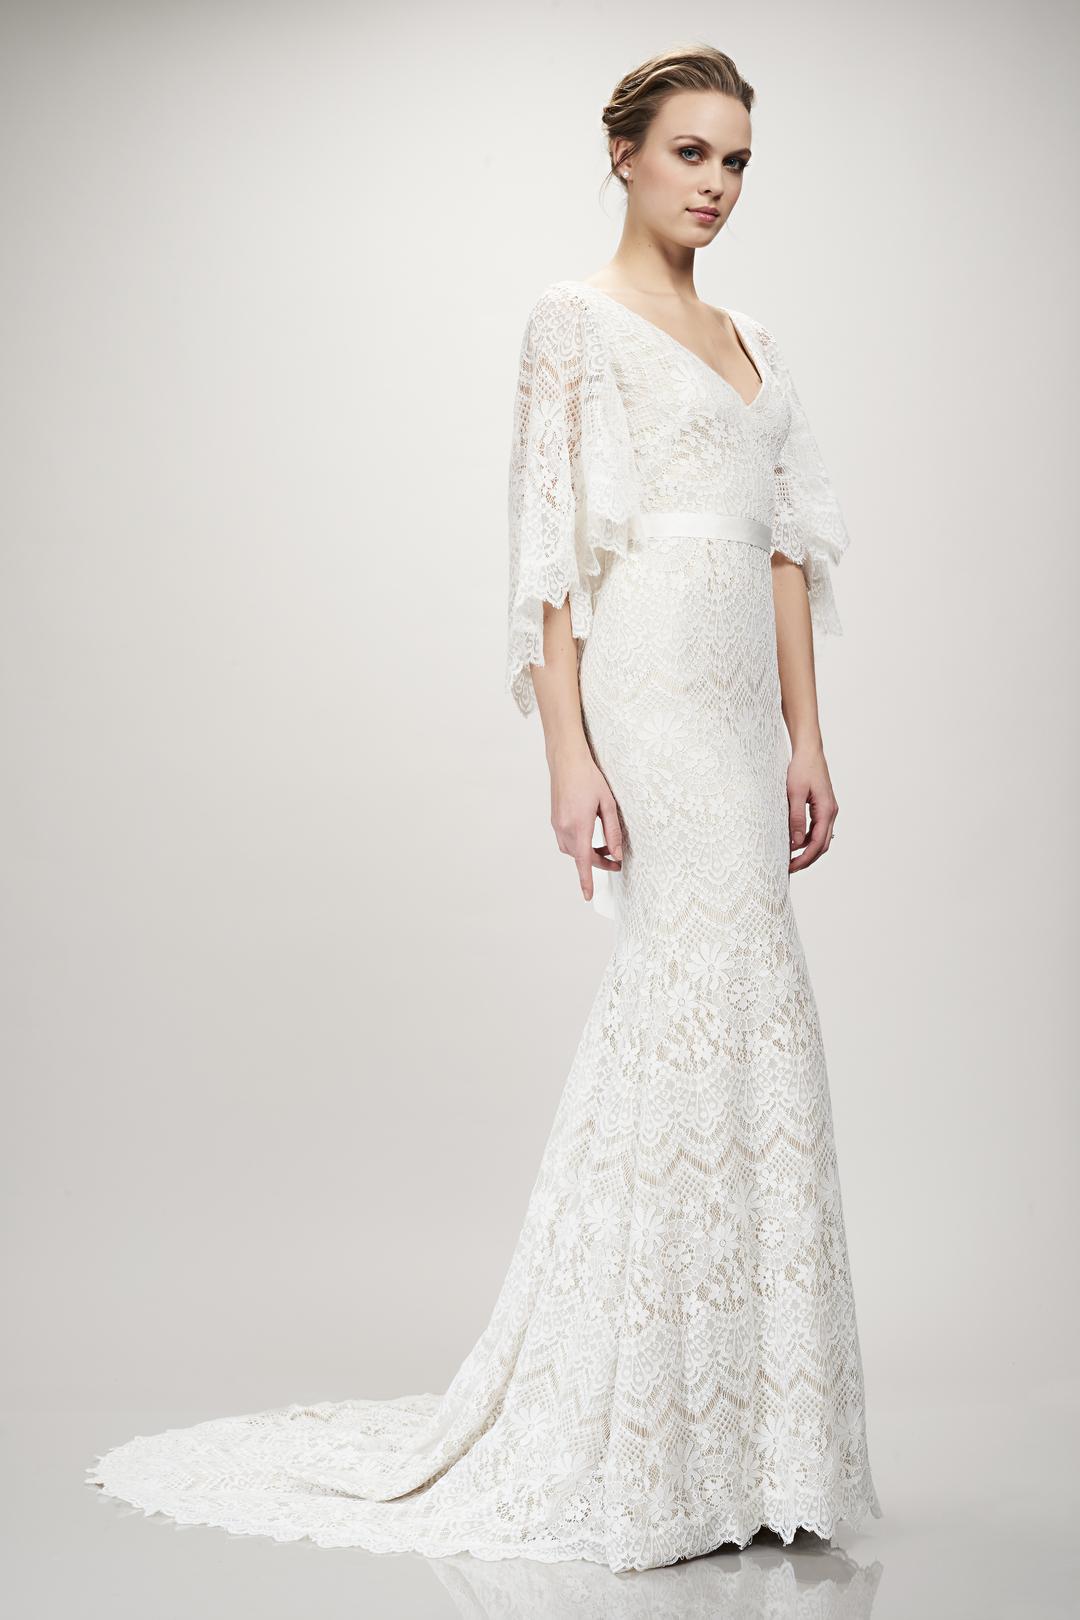 Dress main 2x 1547042505